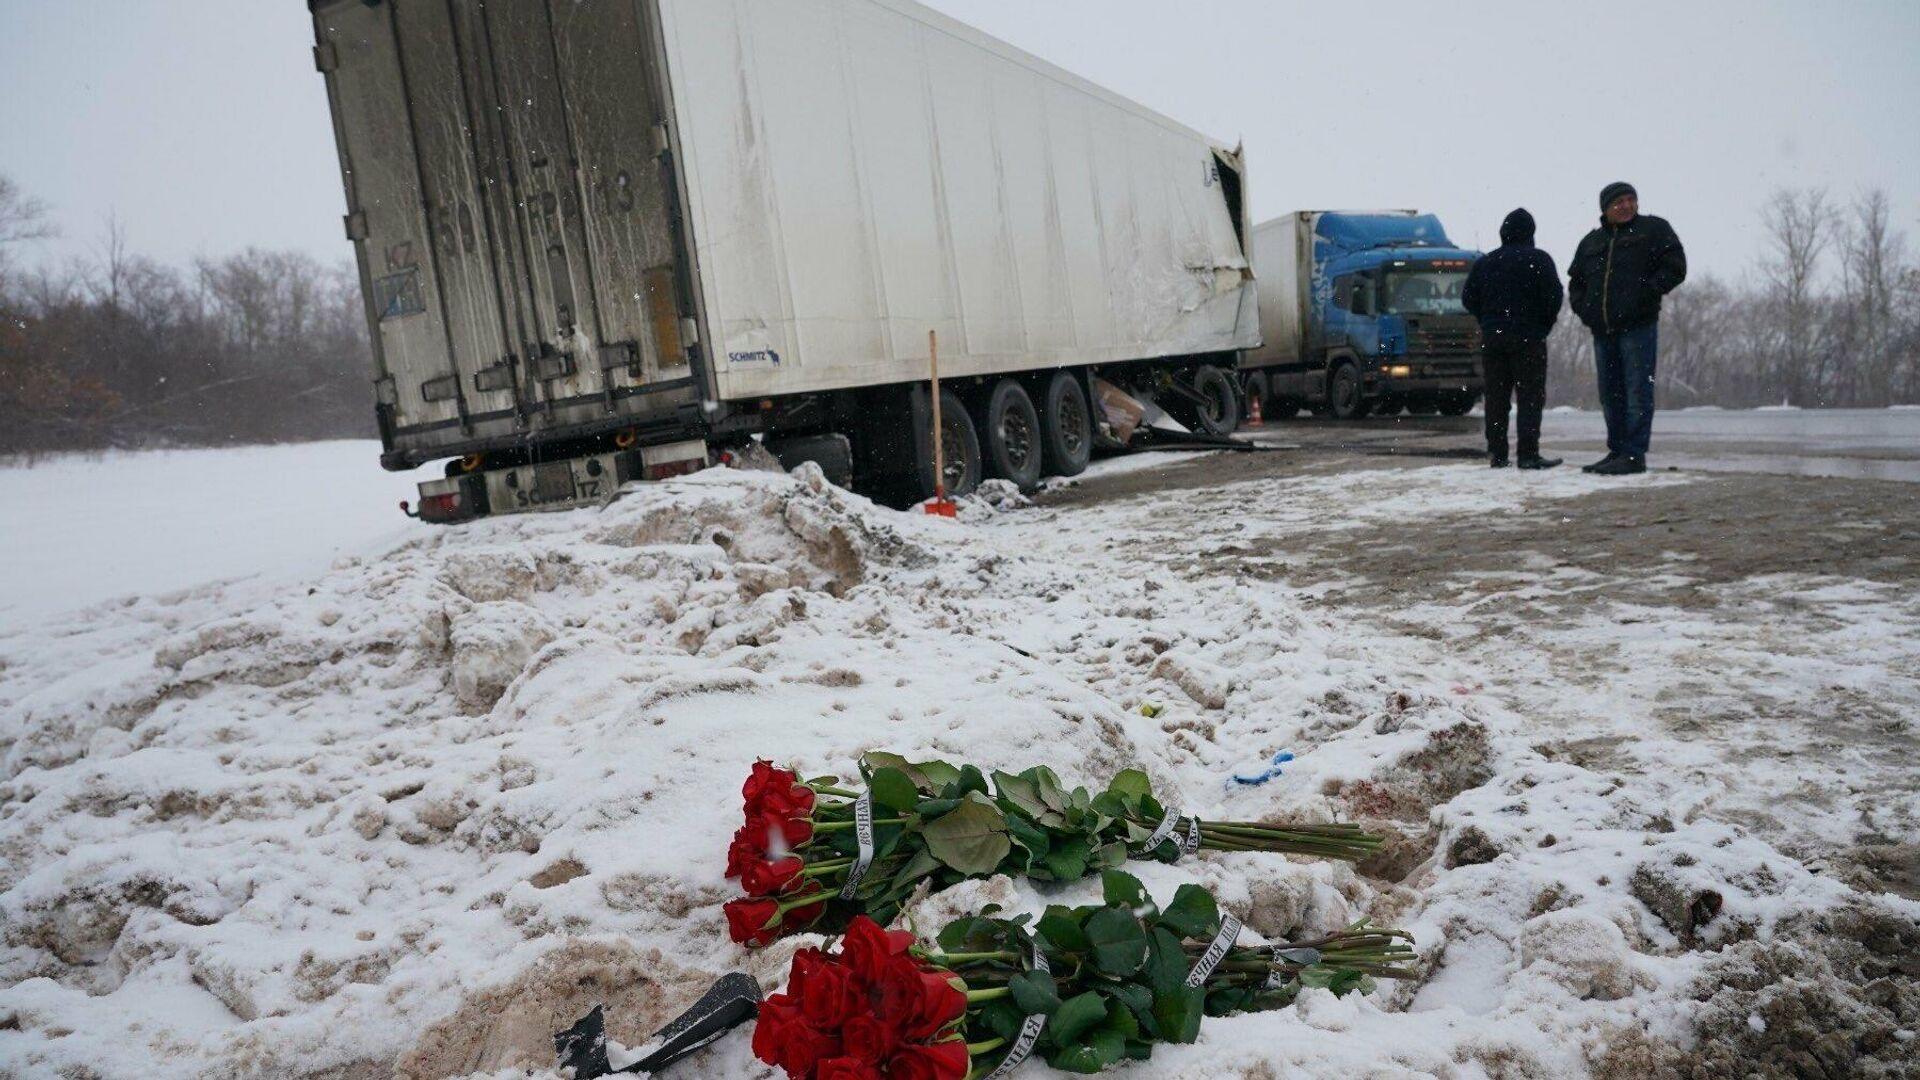 Цвета на месте аварии на трассе М5 под Сызранью - РИА Новости, 1920, 01.02.2021